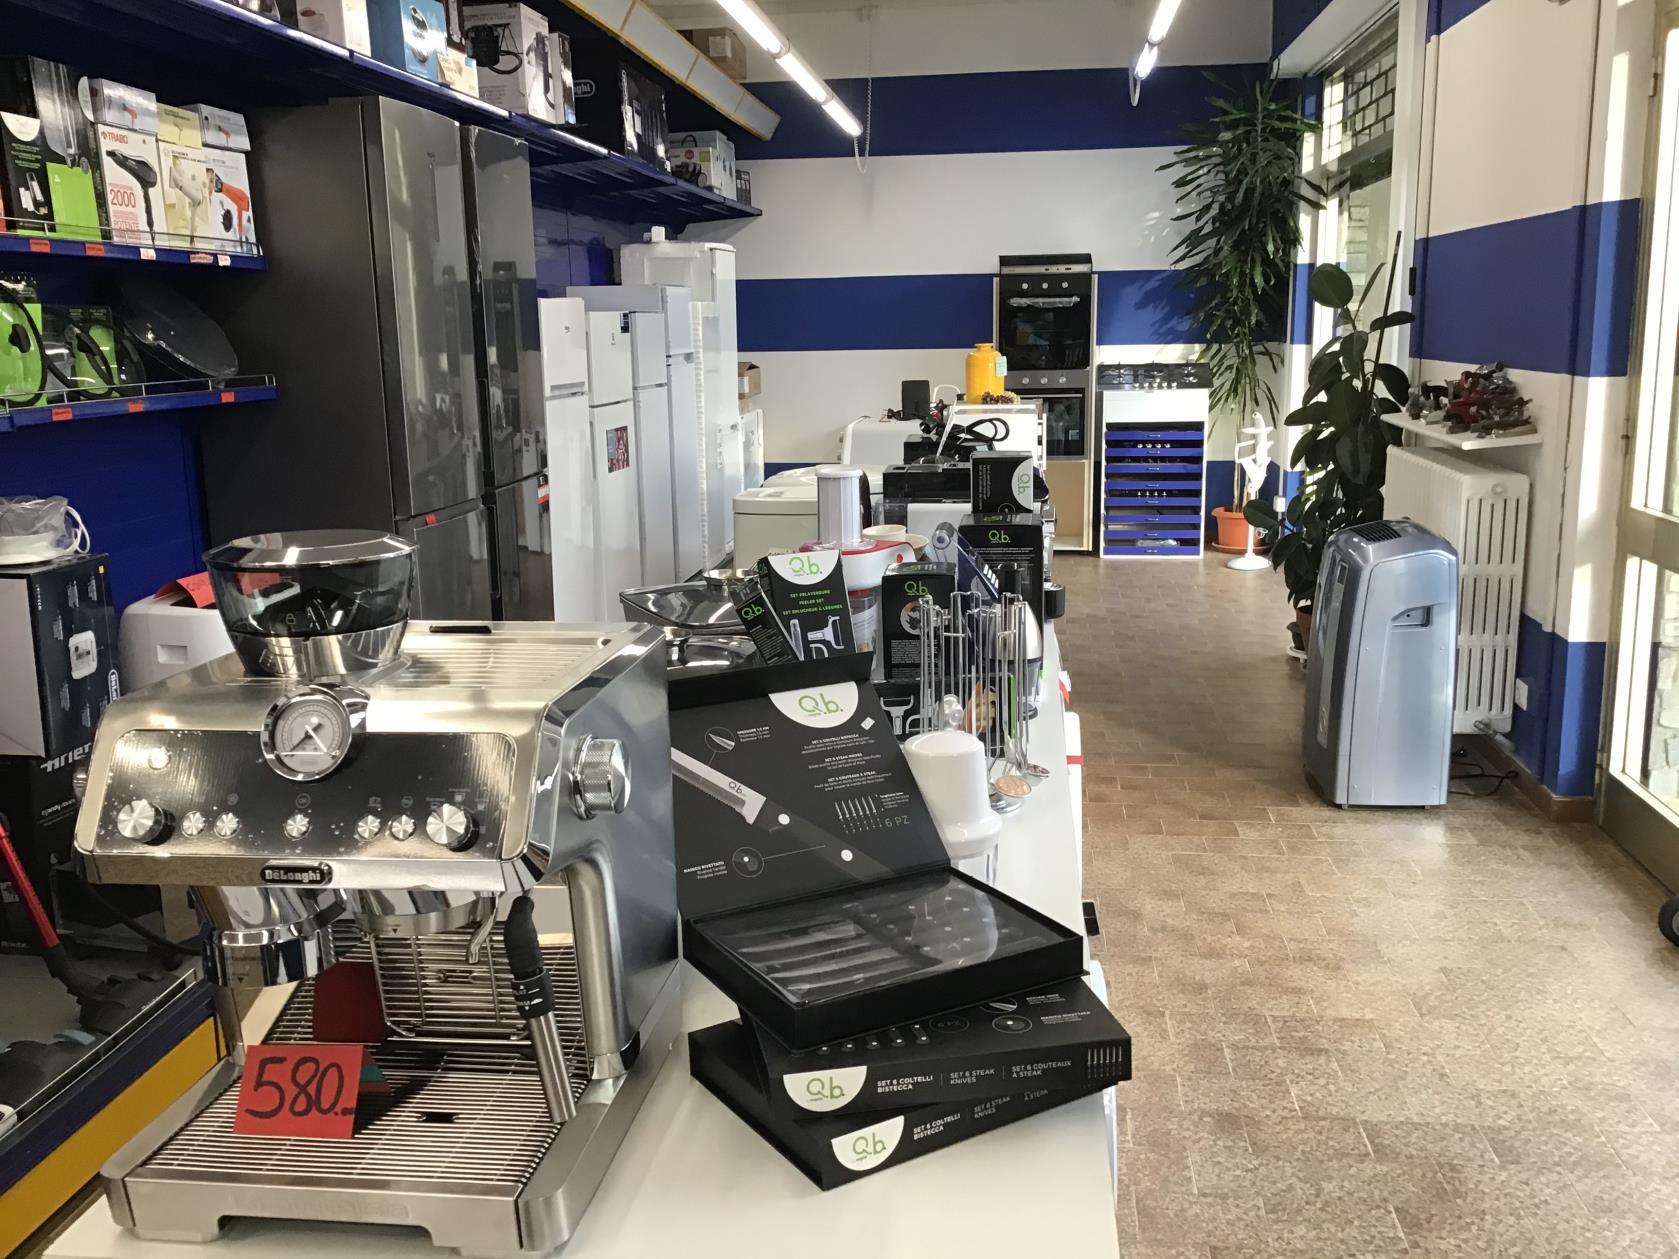 Produzione e vendita macchine da caffe e capsule